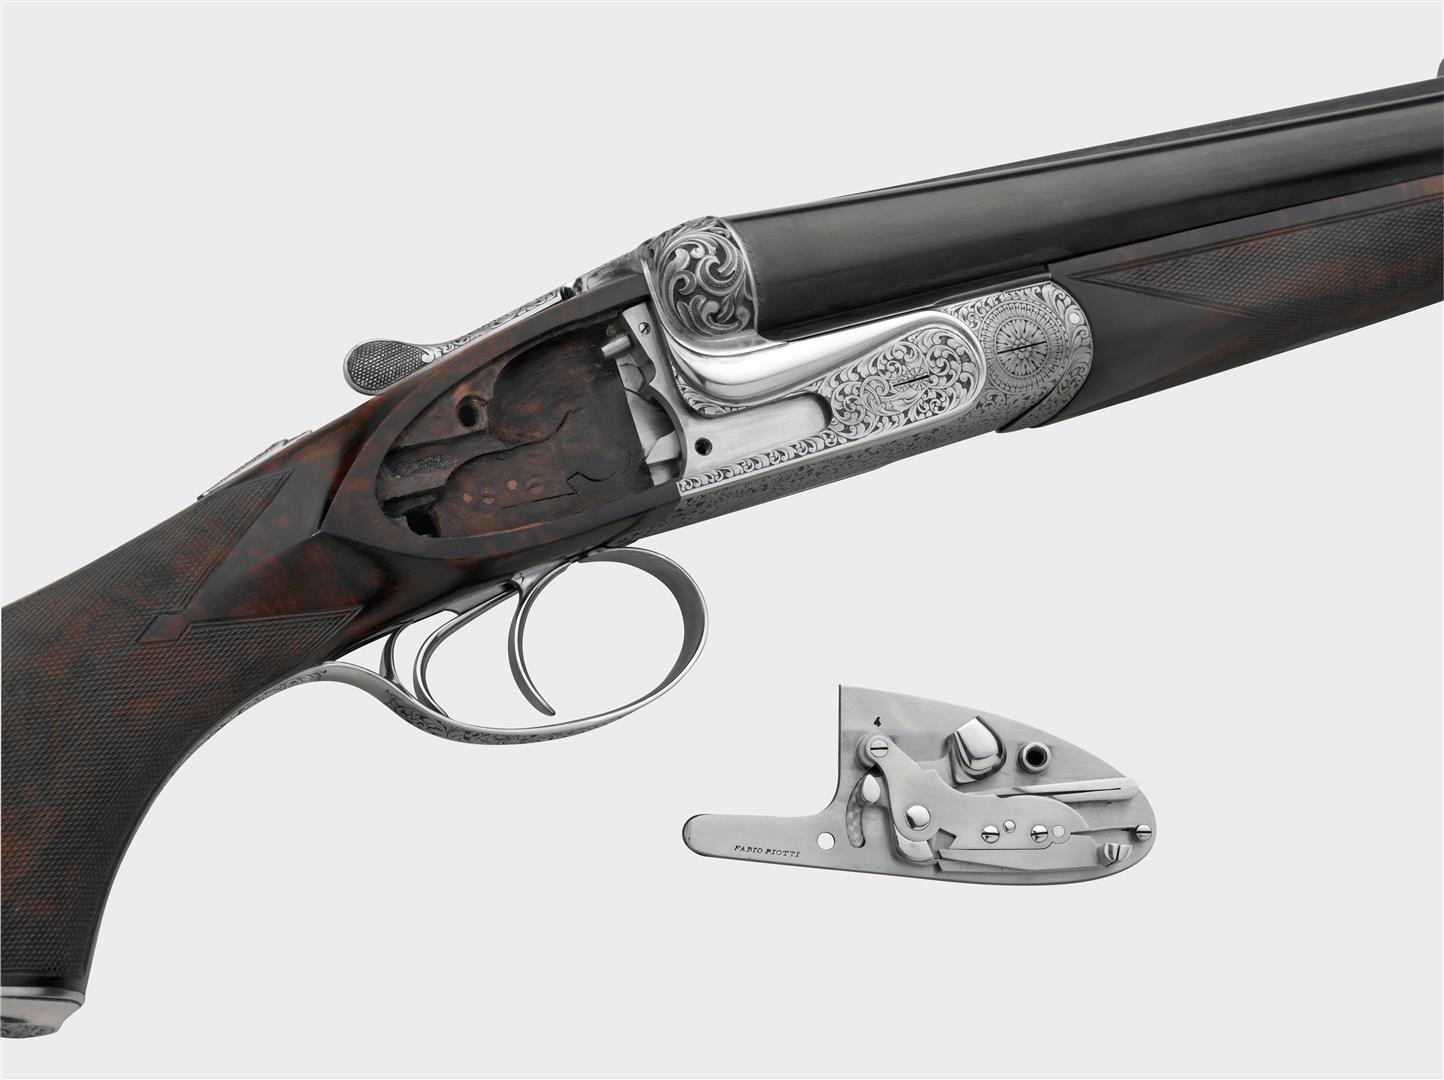 Piotti sidelock gun